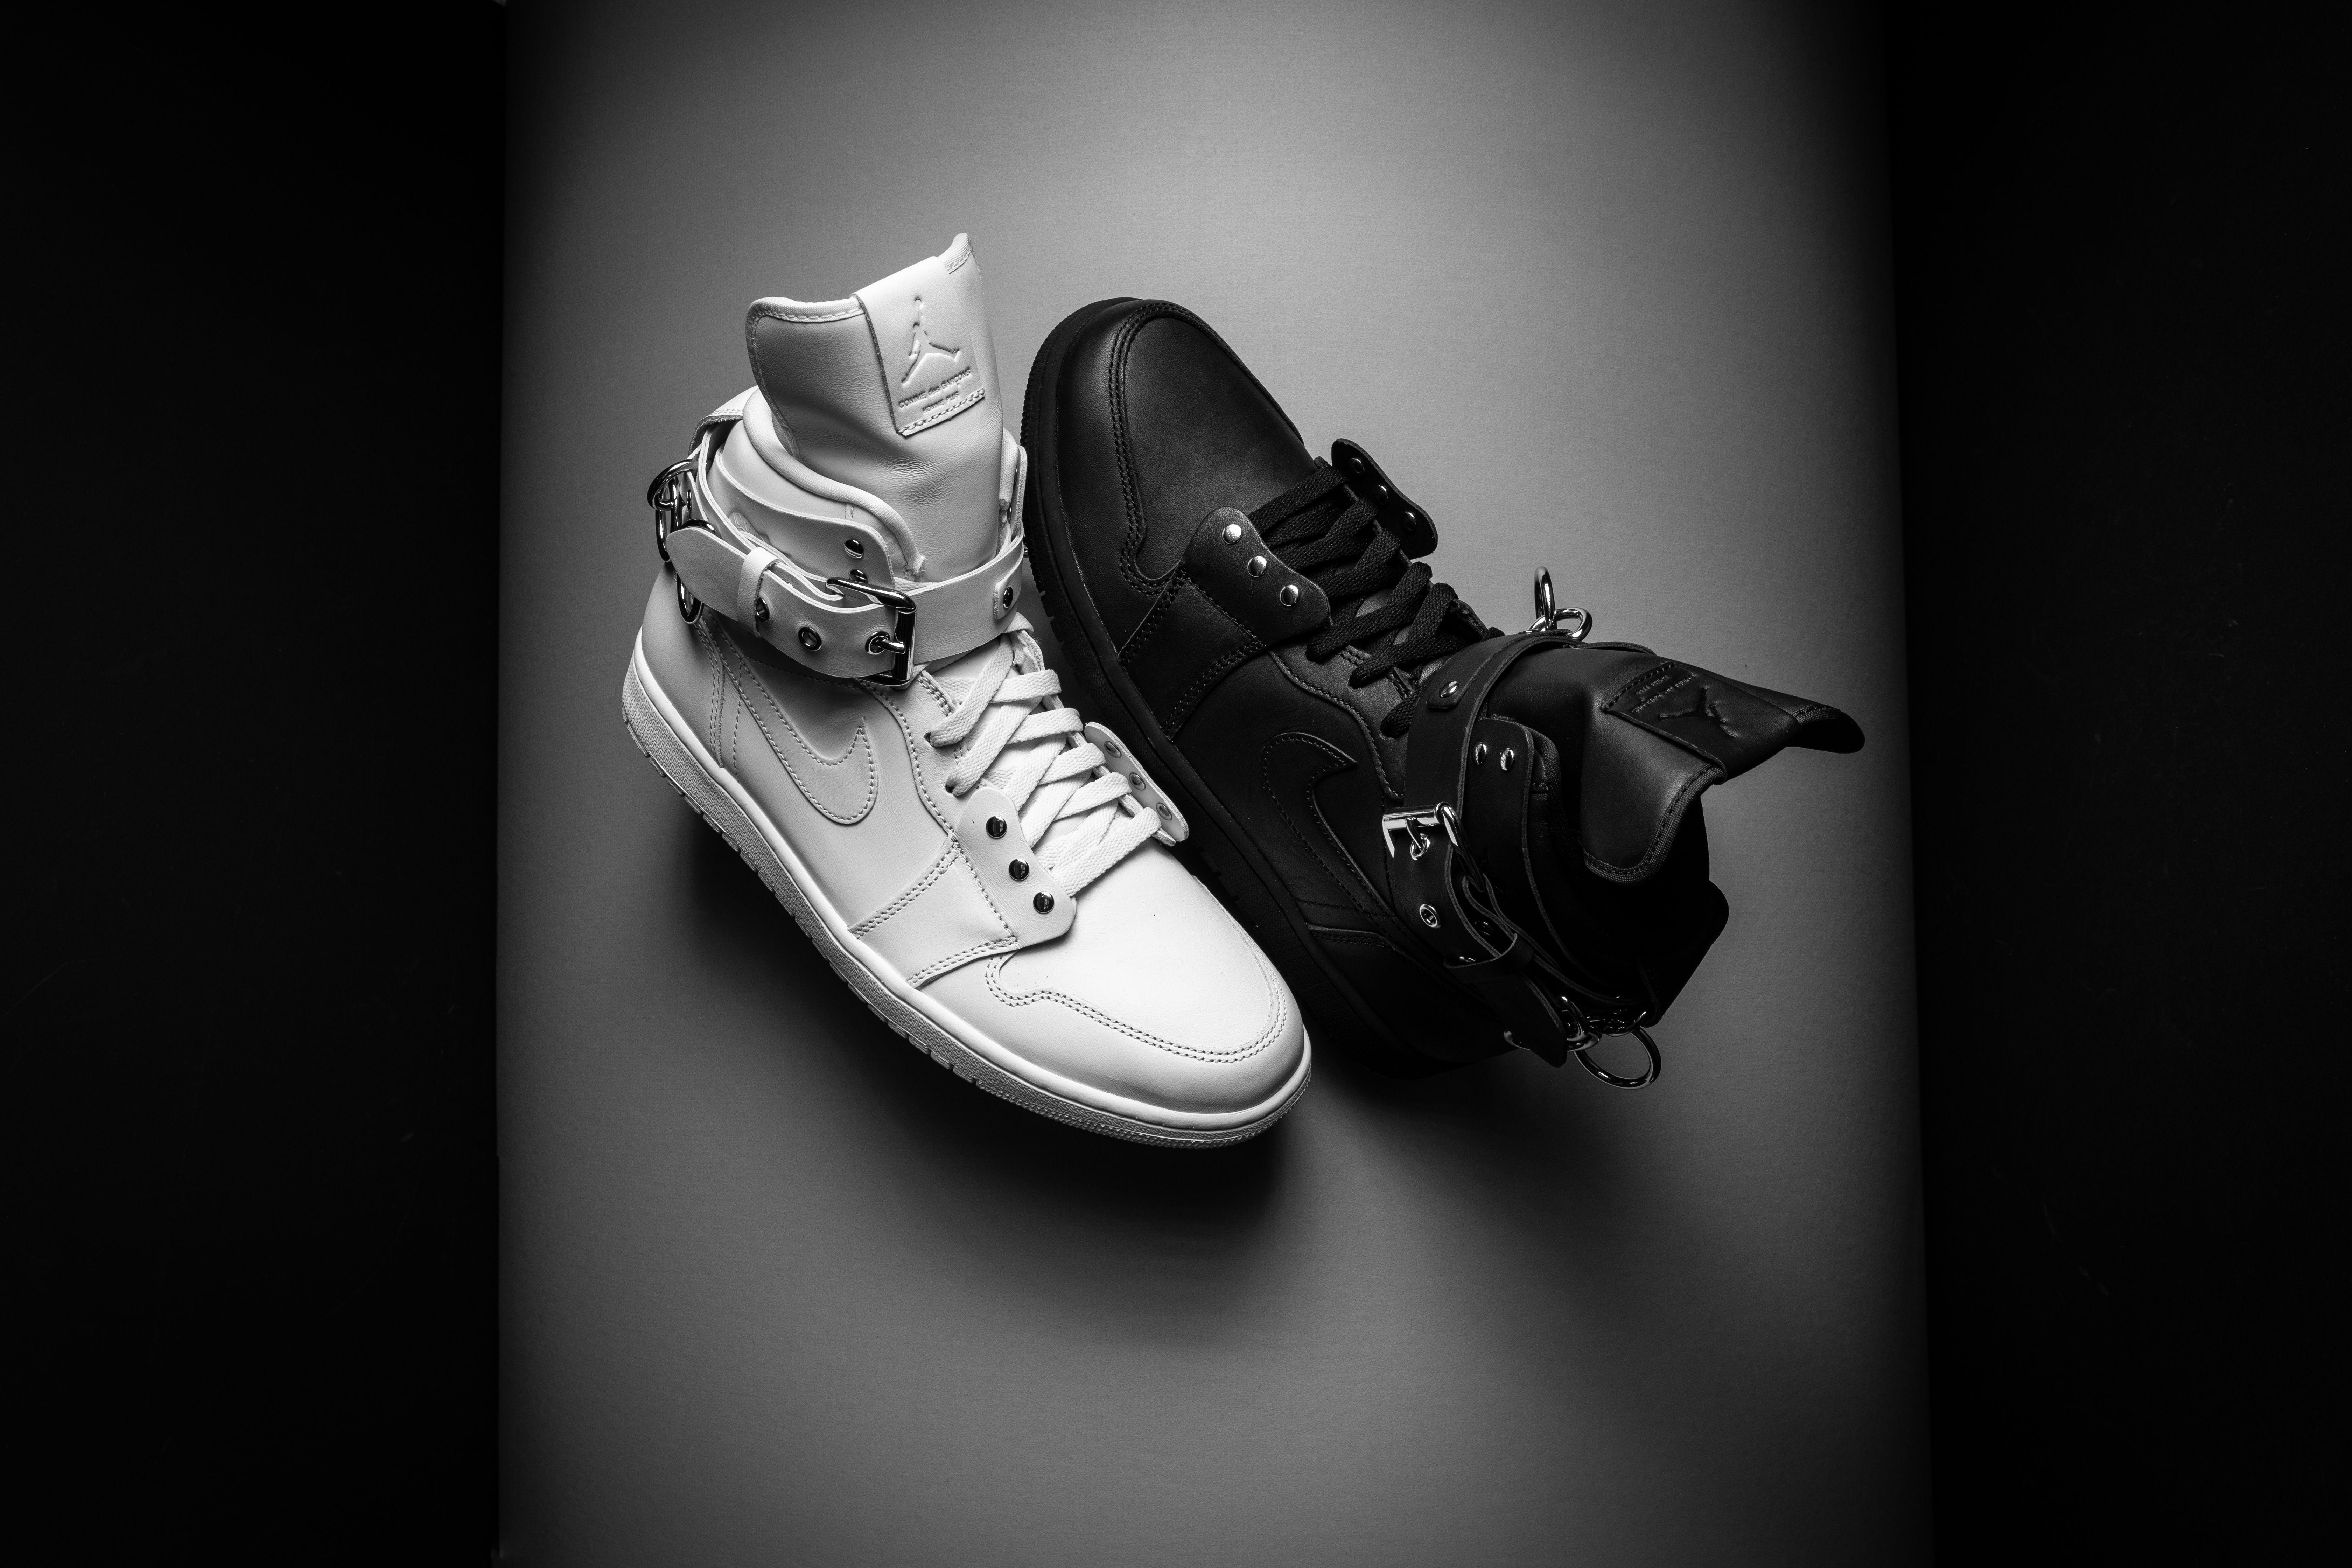 Comme des Garçons takes the Air Jordan 1 to delirious new